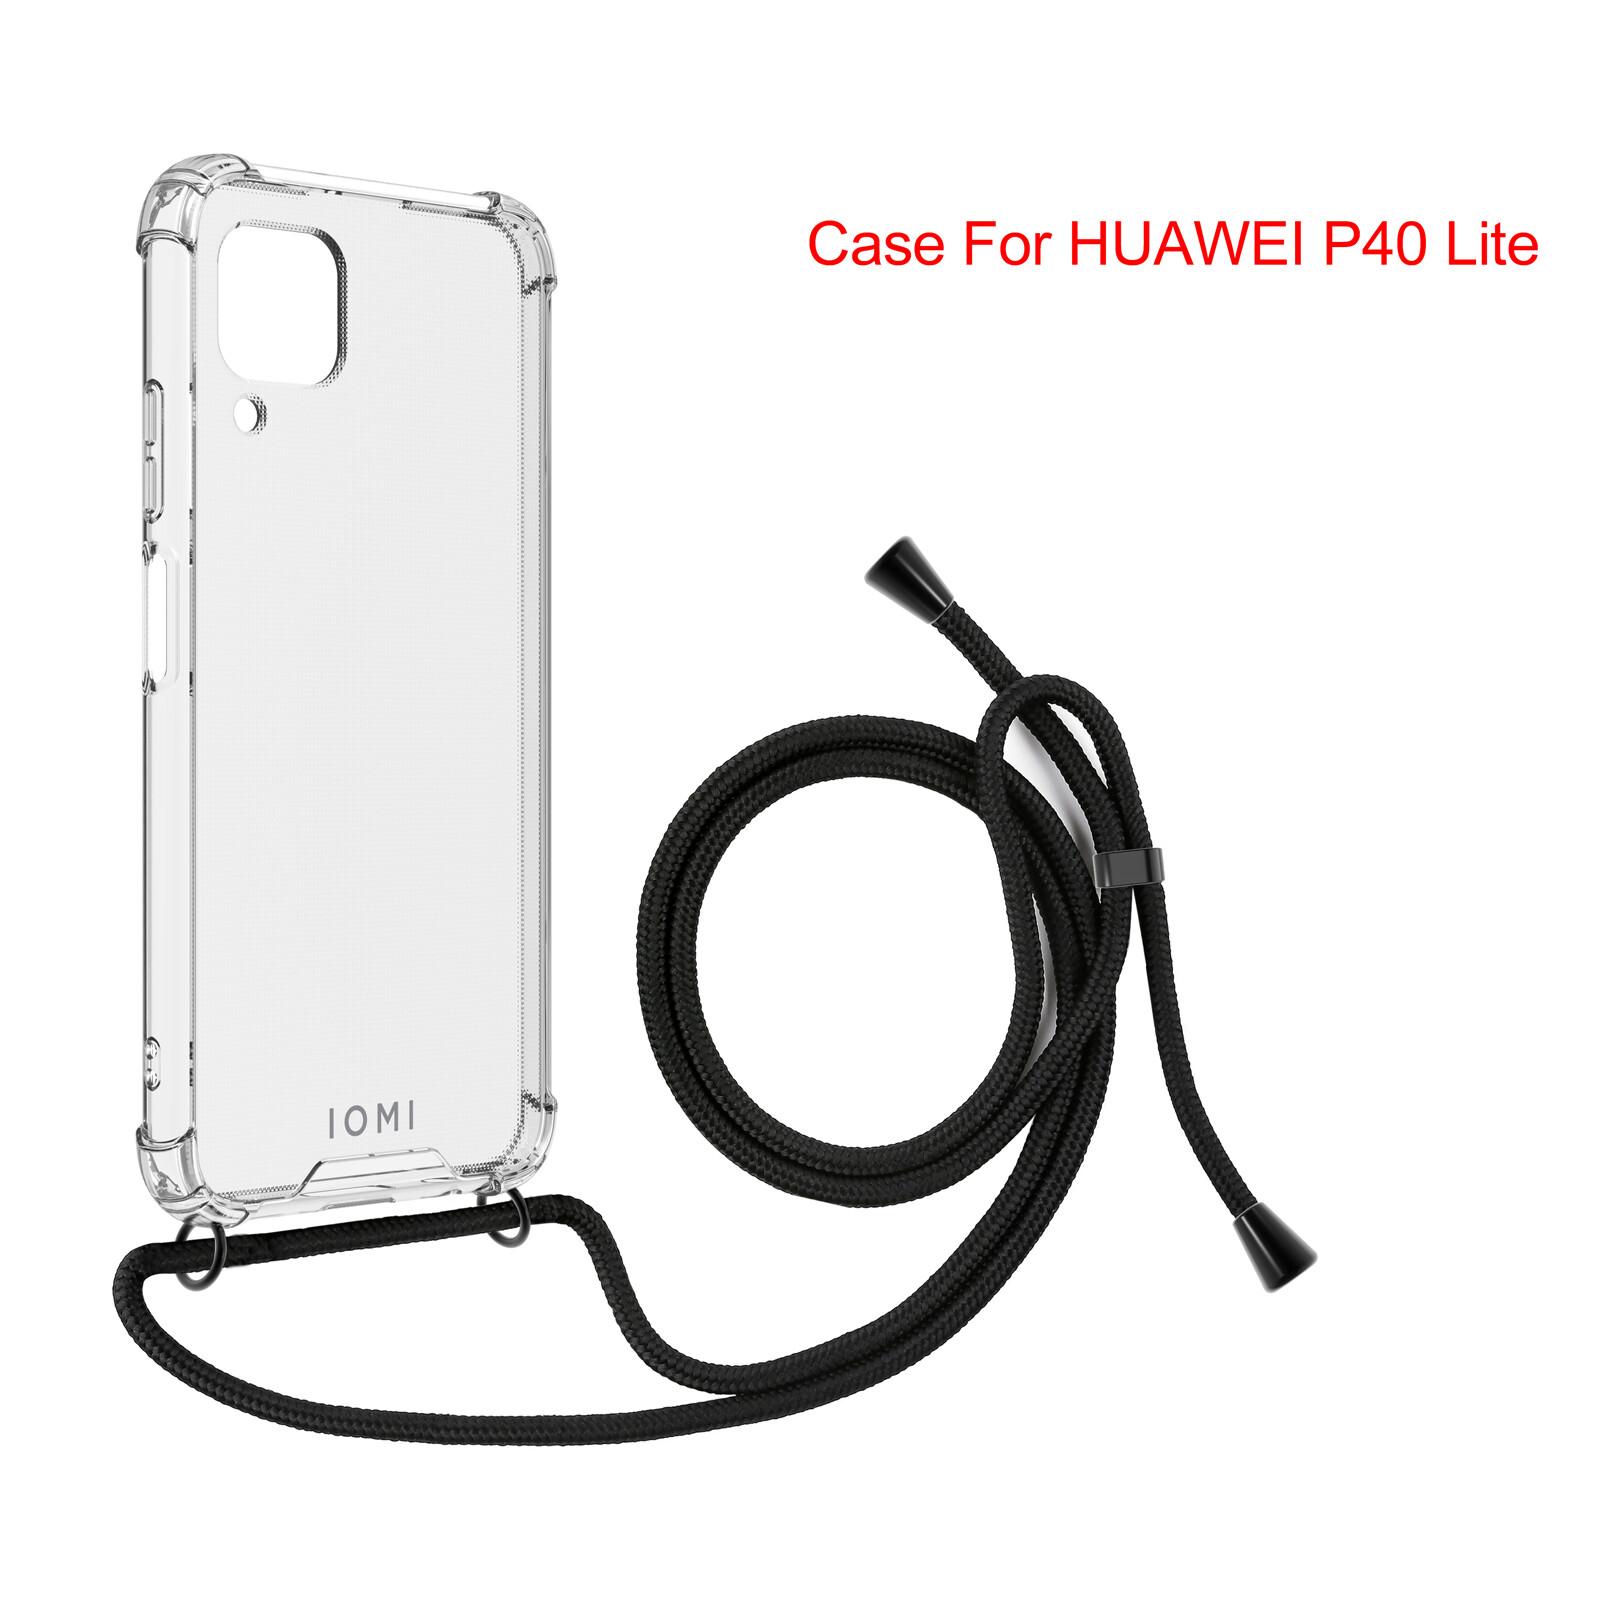 IOMI Back Crossbody Huawei P40 Lite inkl. Lanyards